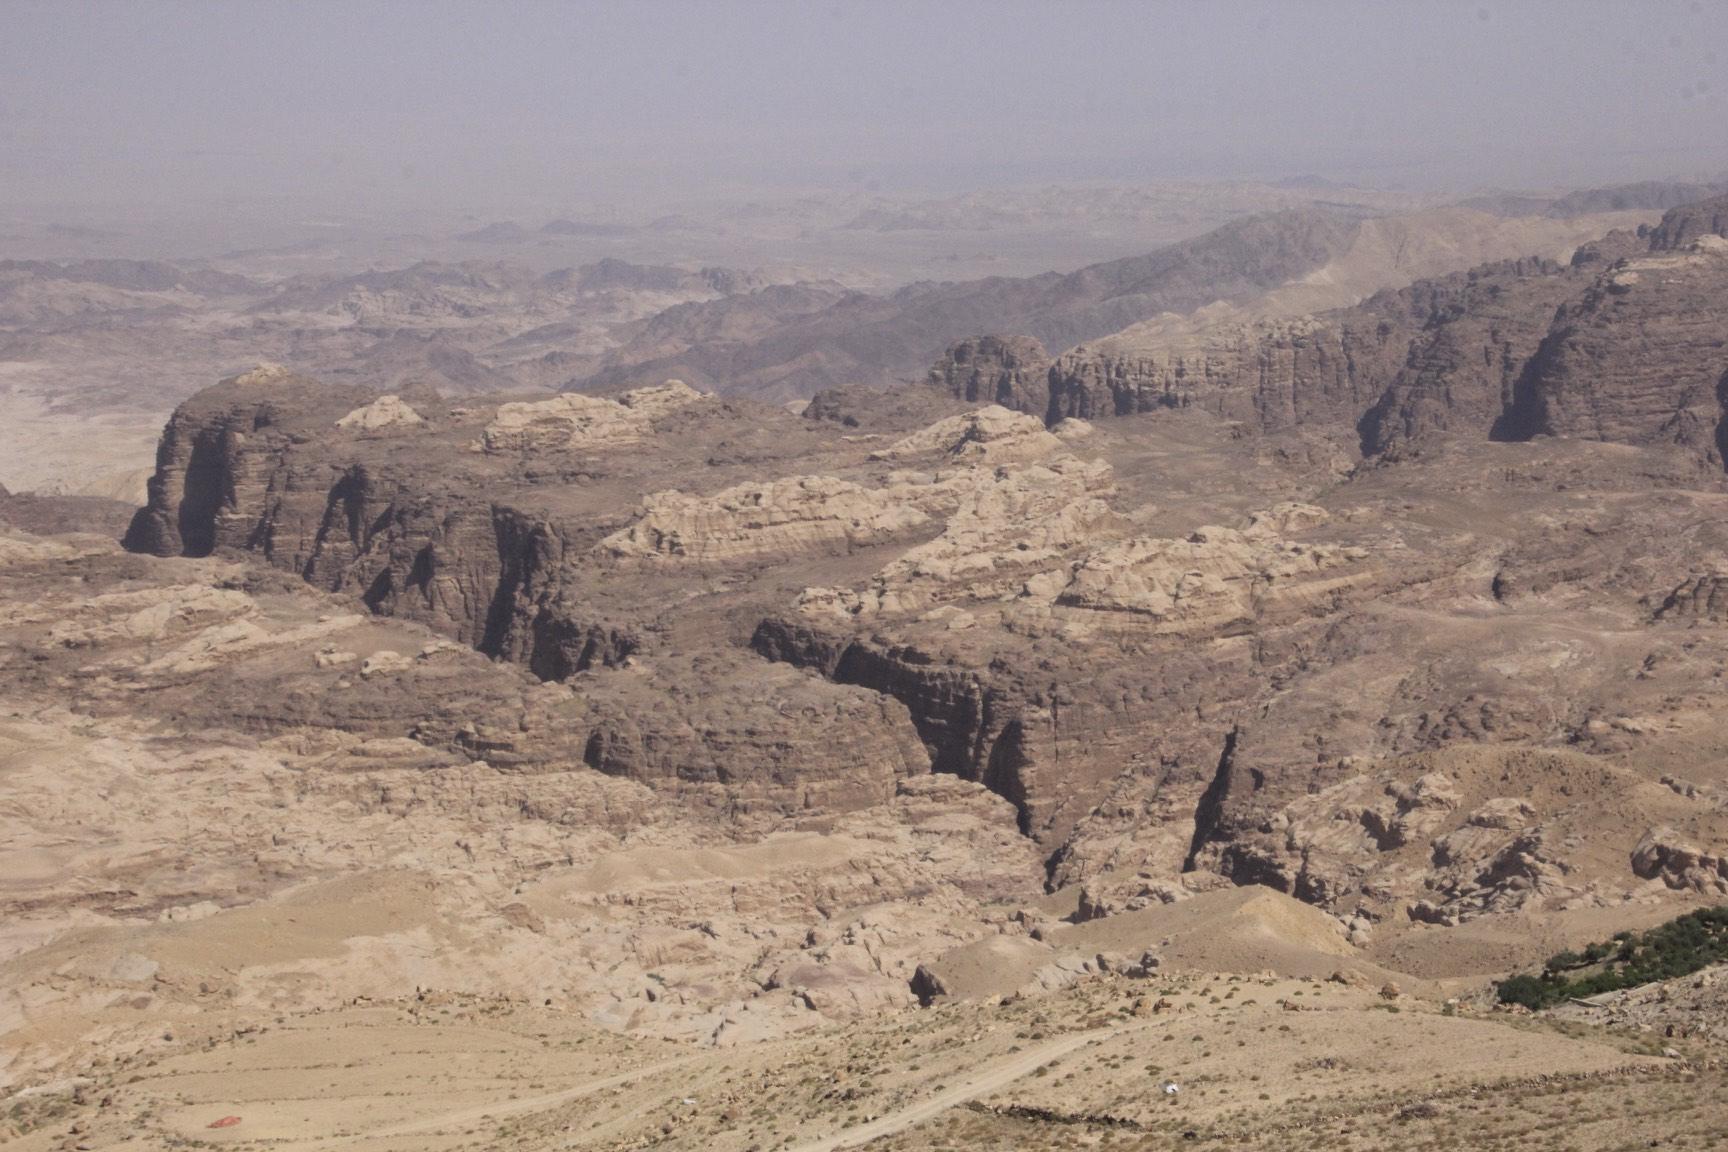 Petra is down below